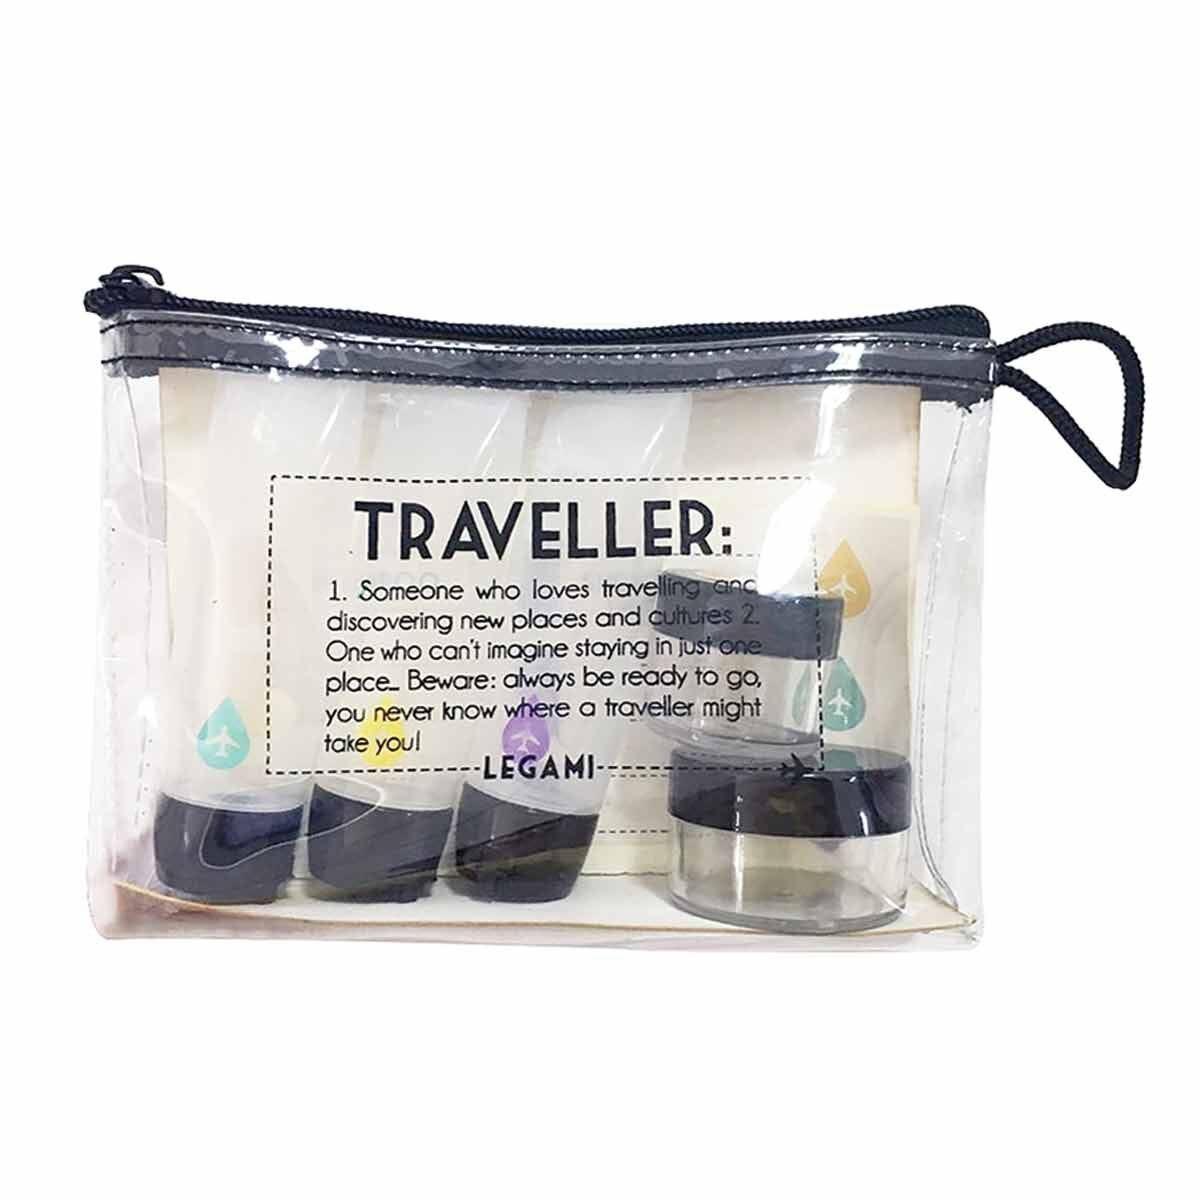 Legami Travel Set